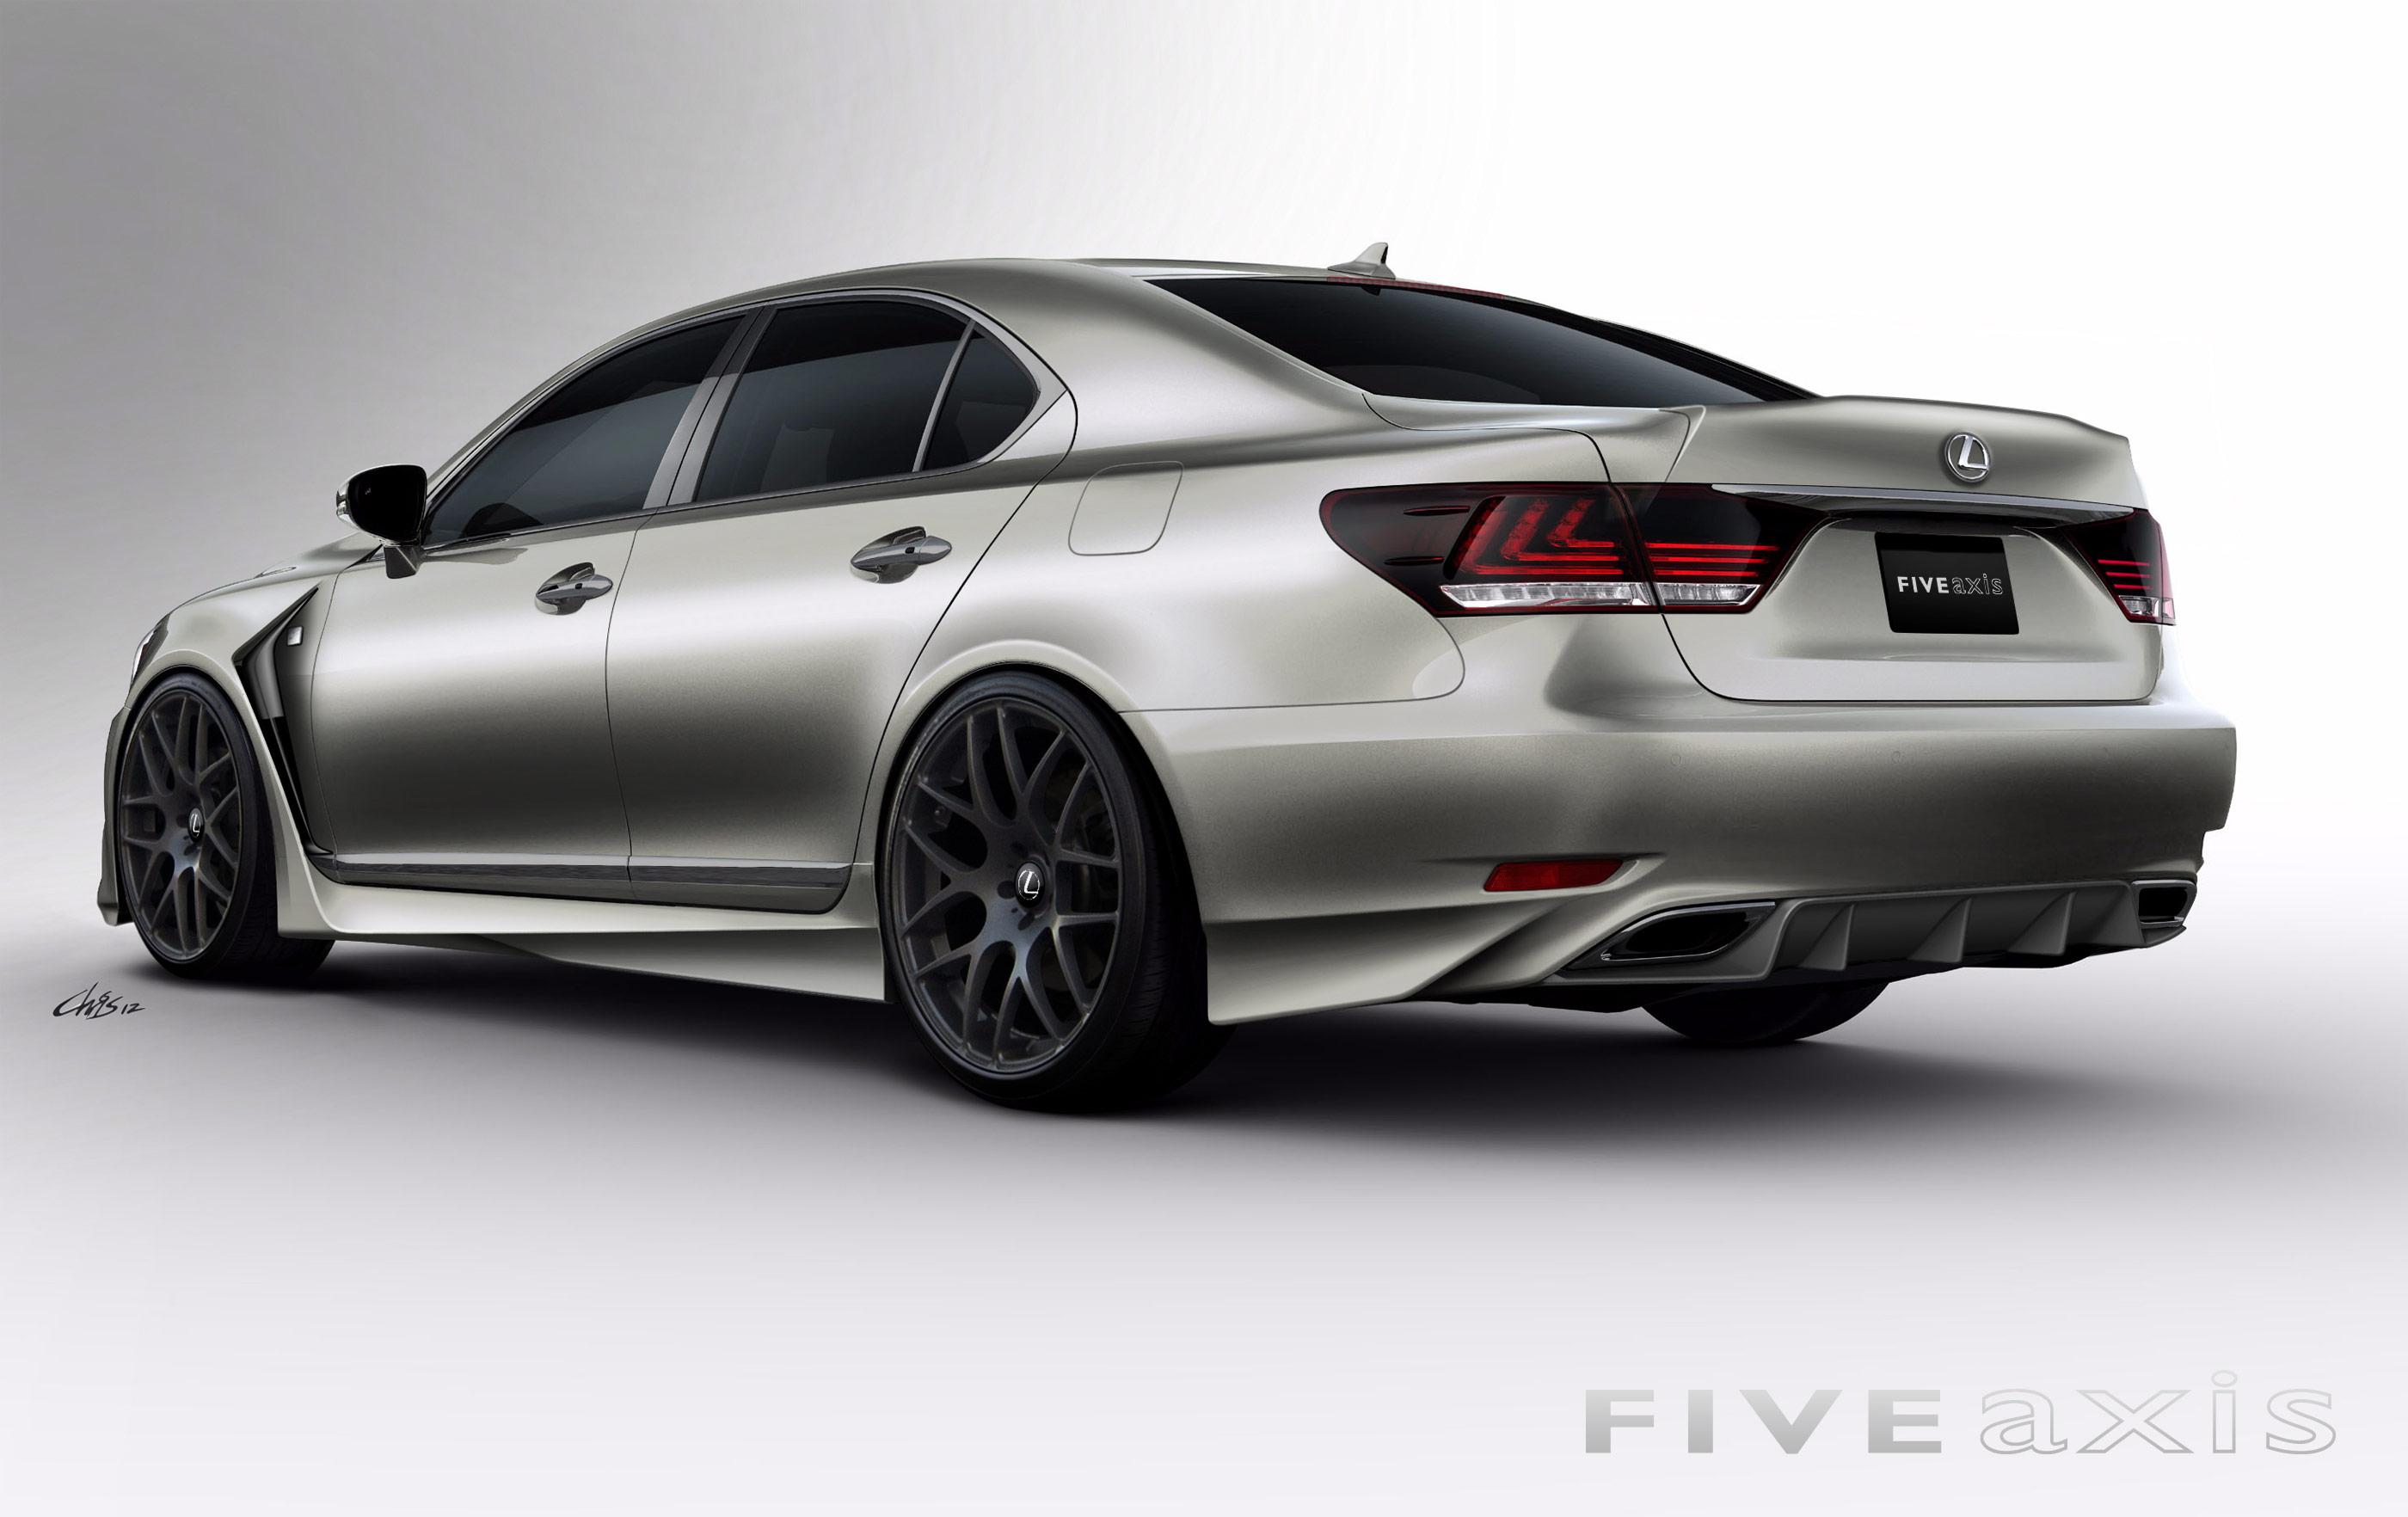 SEMA 2012: Project Lexus LS F SPORT by Five Axis | Lexus ...